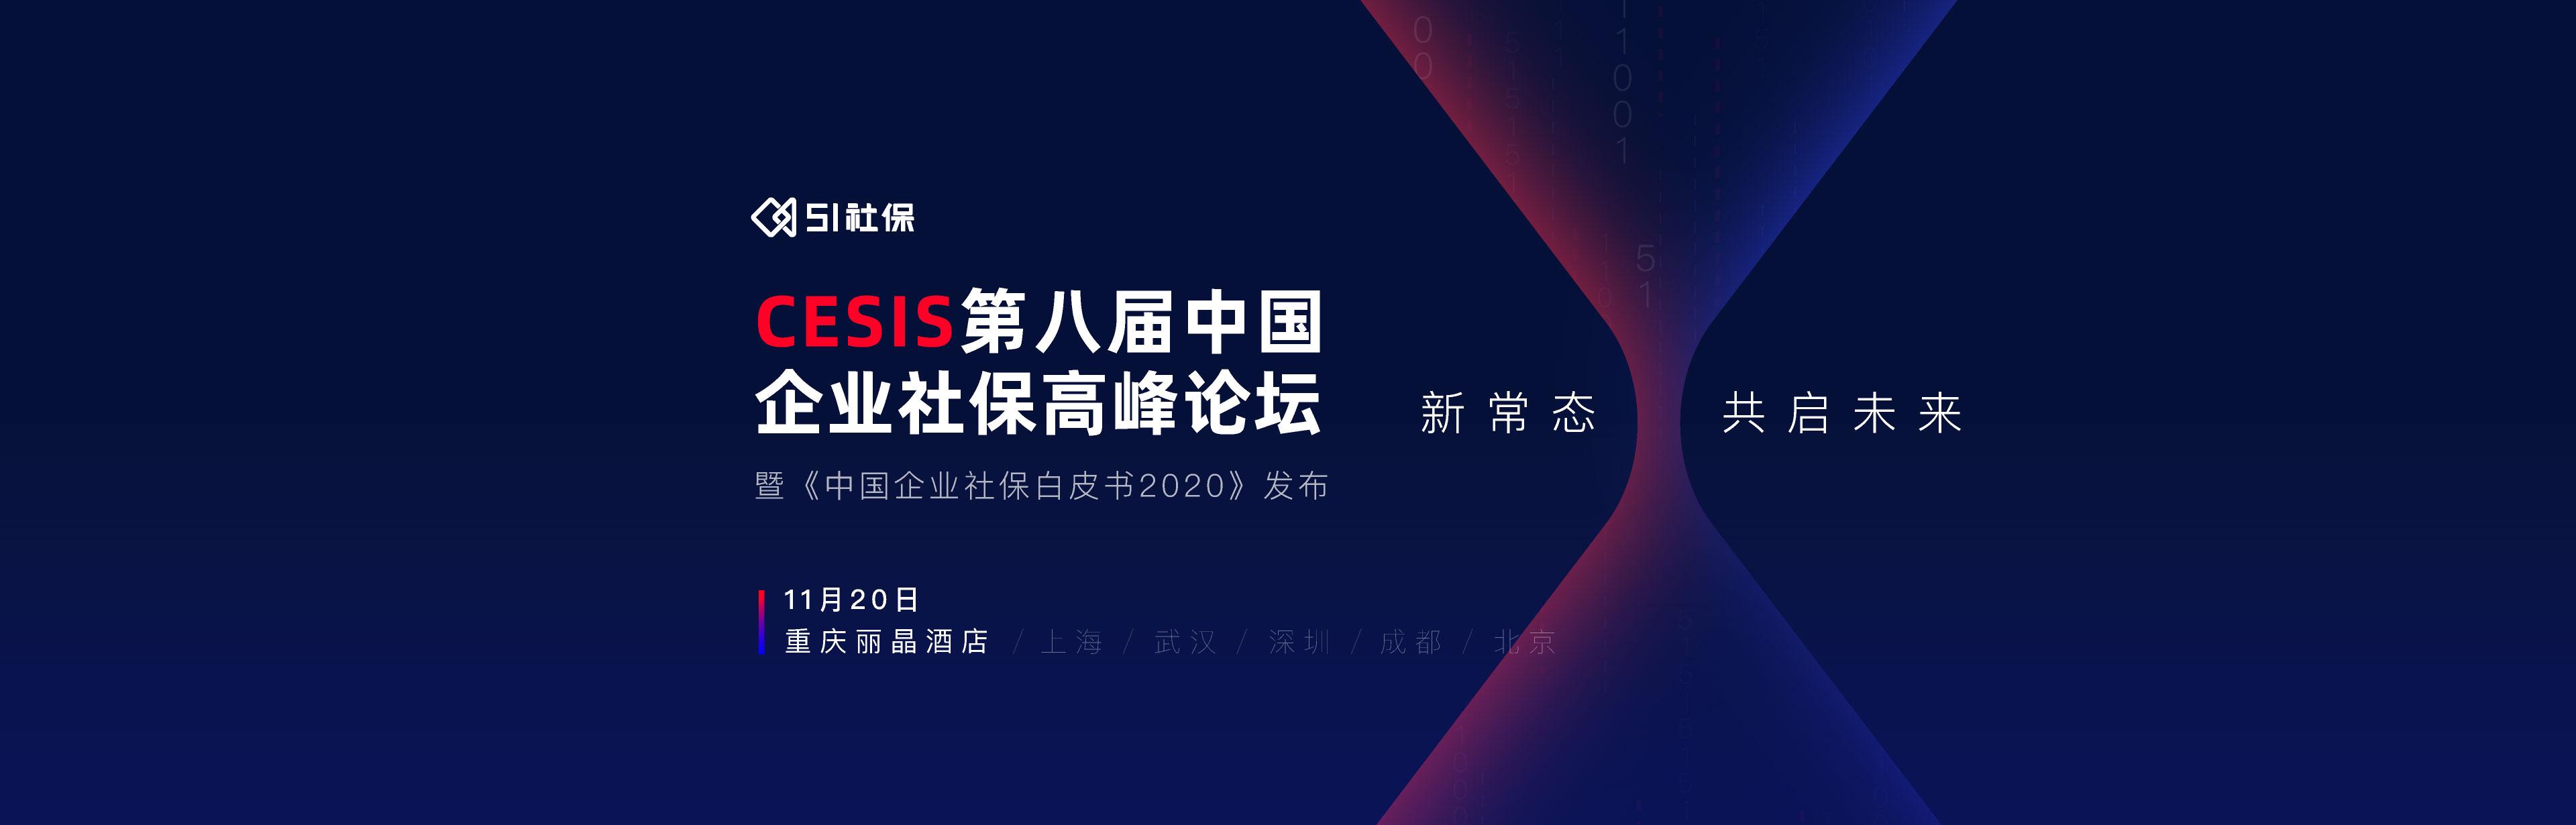 CESIS·第八届中国企业社保高峰论坛-重庆站报名启动